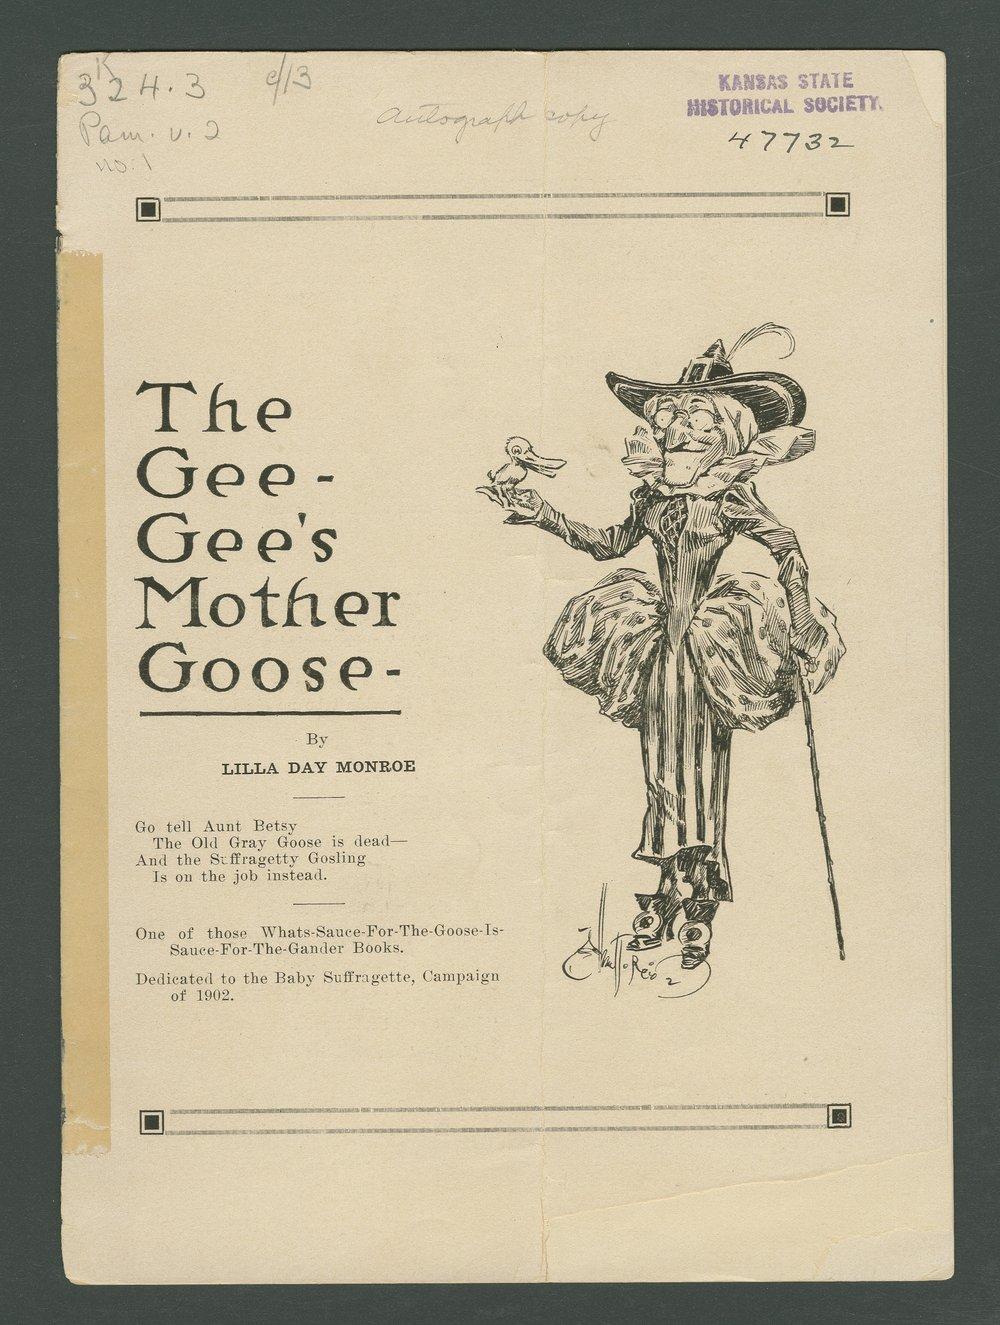 The Gee-Gee's Mother Goose - Kansas Memory - Kansas